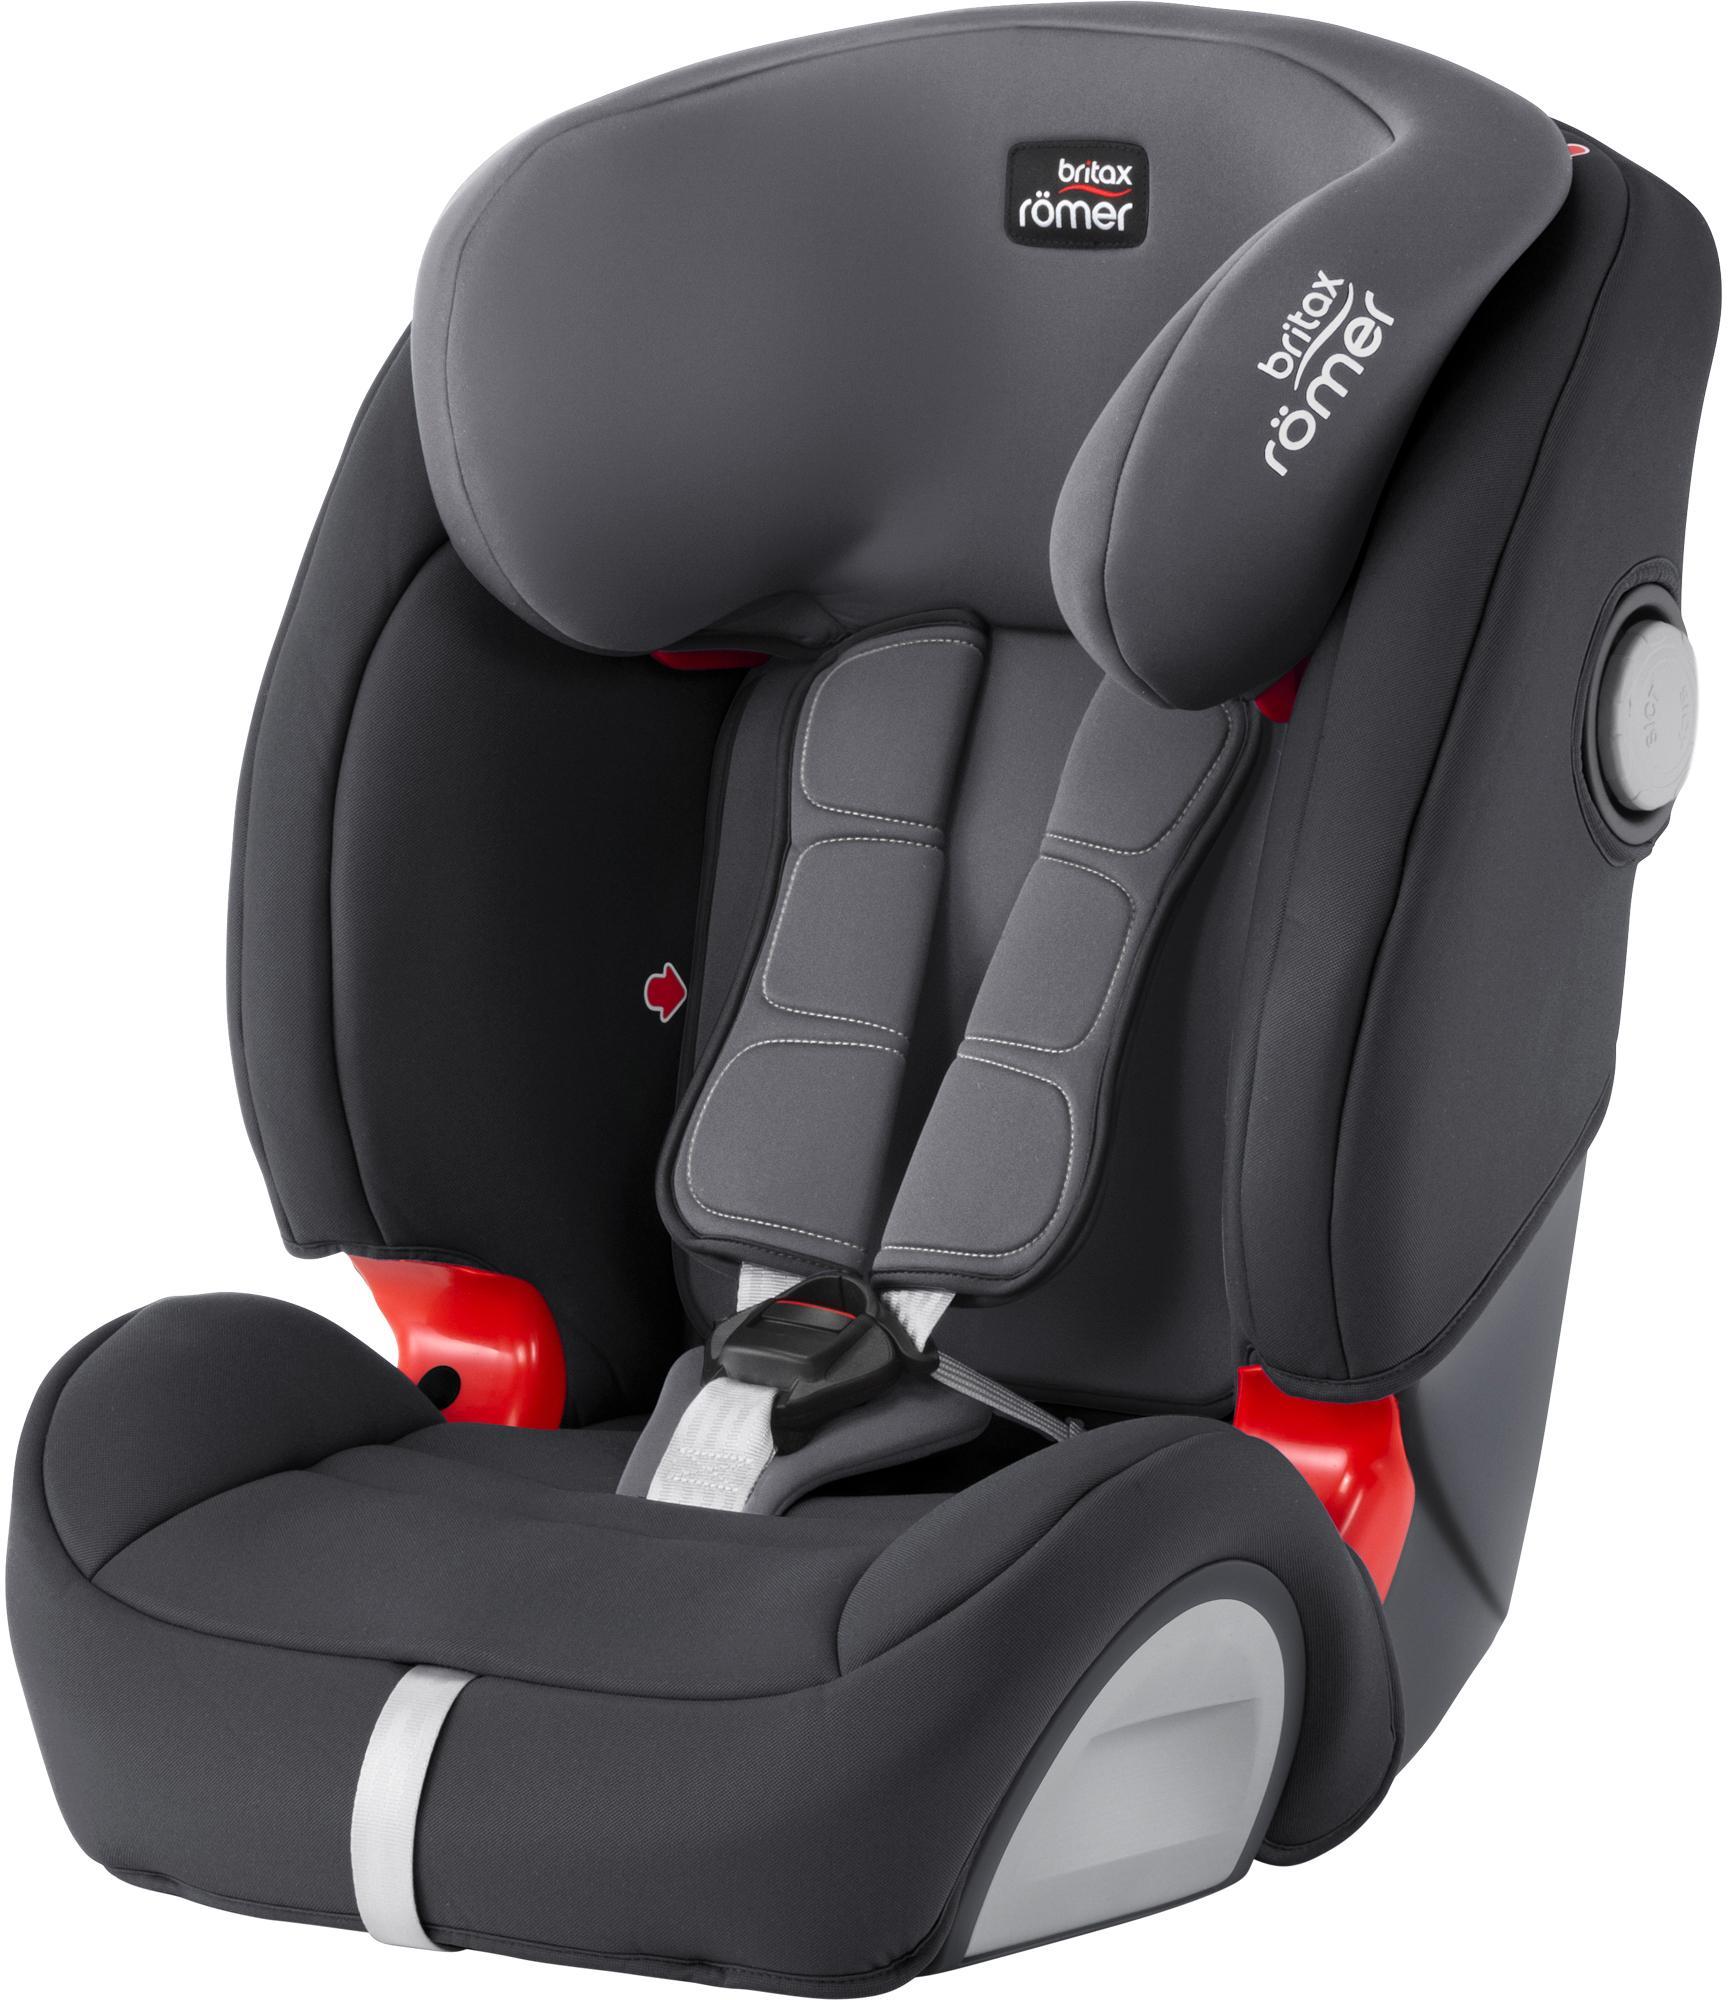 Britax Evolva 1-2-3 Sl Sict Child Car Seat - Storm Grey